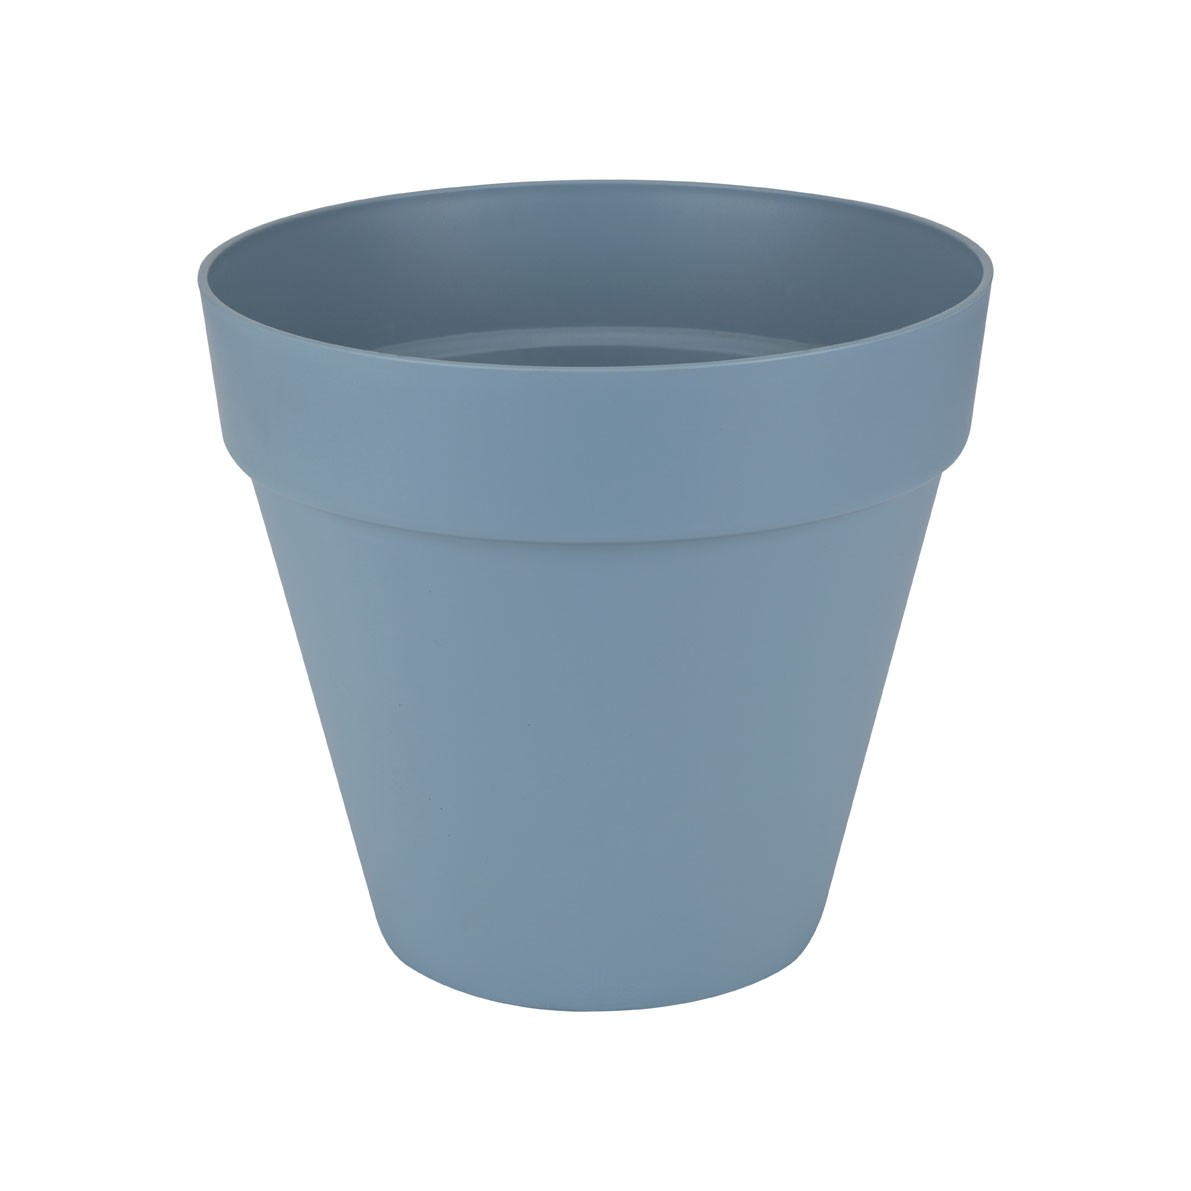 Pflanzgefäß / Pflanztopf elho Loft Urban Round Ø 30cm H 26cm blau Bild 1